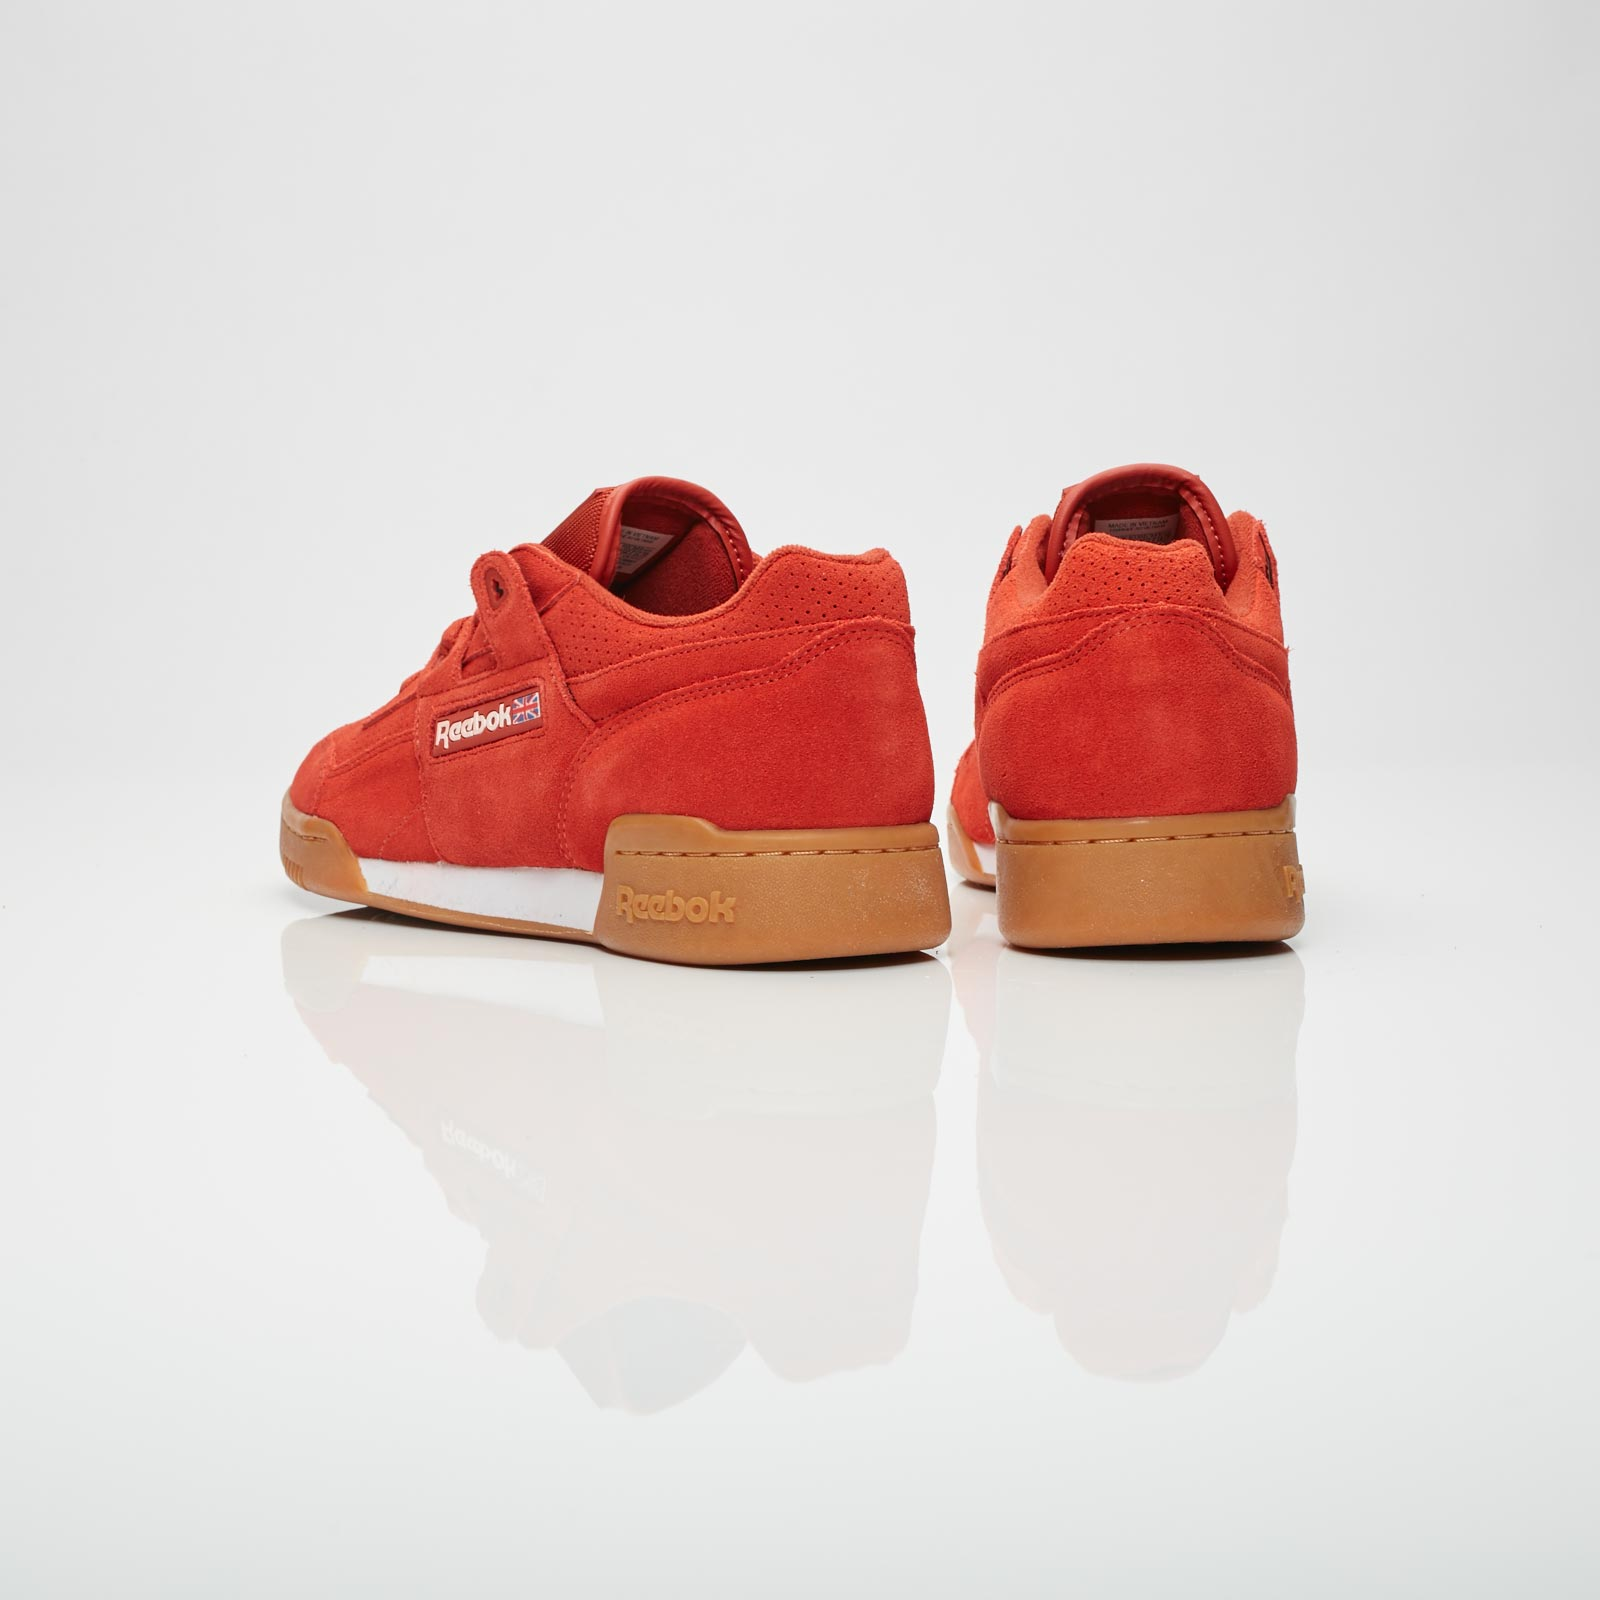 40d30ad9288 Reebok Workout Plus EG - Cn1052 - Sneakersnstuff